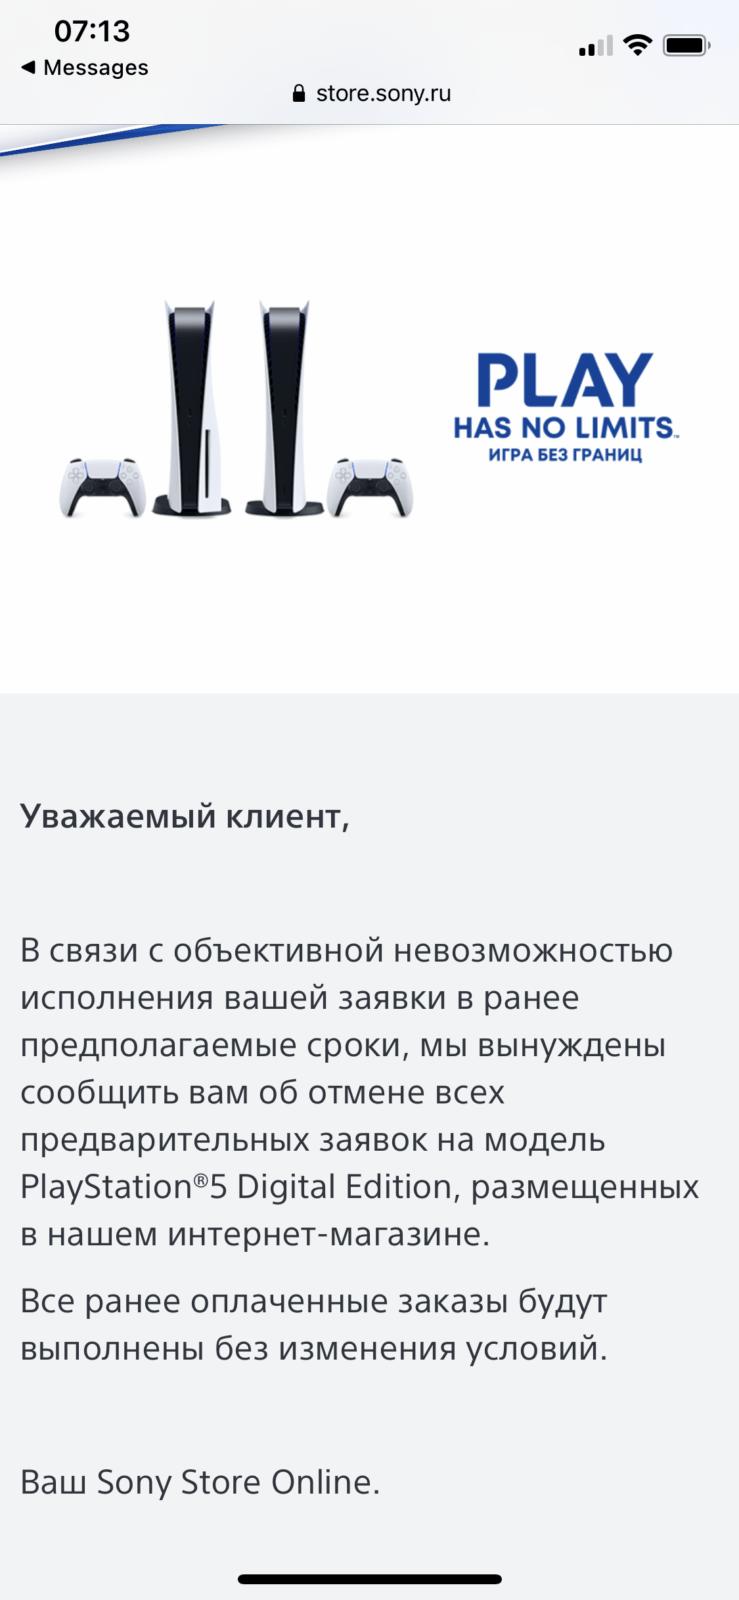 Sony отменила предзаказы на PlayStation 5 в России (24de4a67 dcf0 4cbd a702 3bd63ec0ac2c)